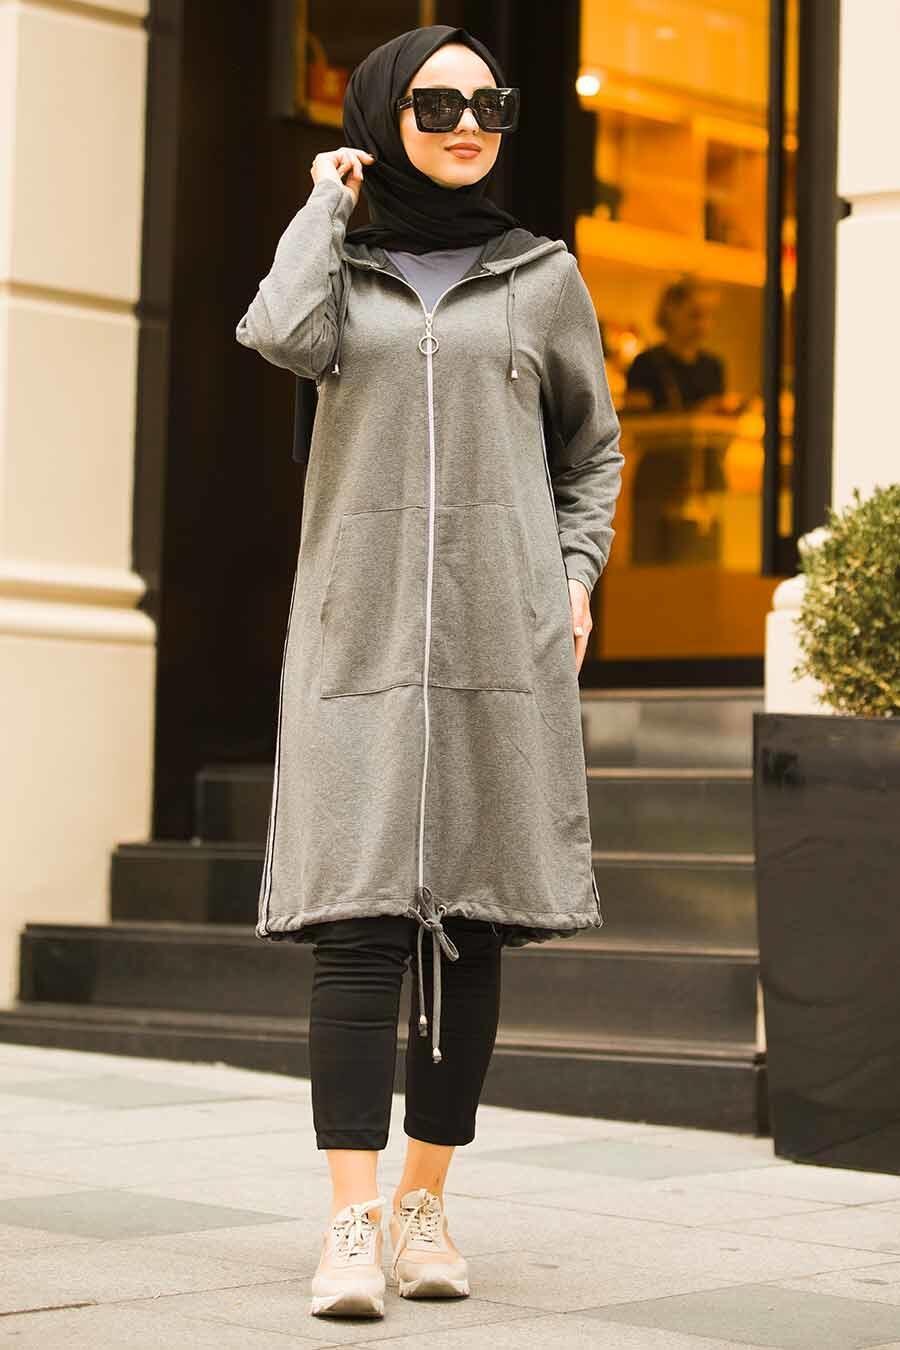 Neva Style - Smoked Hijab Coat 6029FU